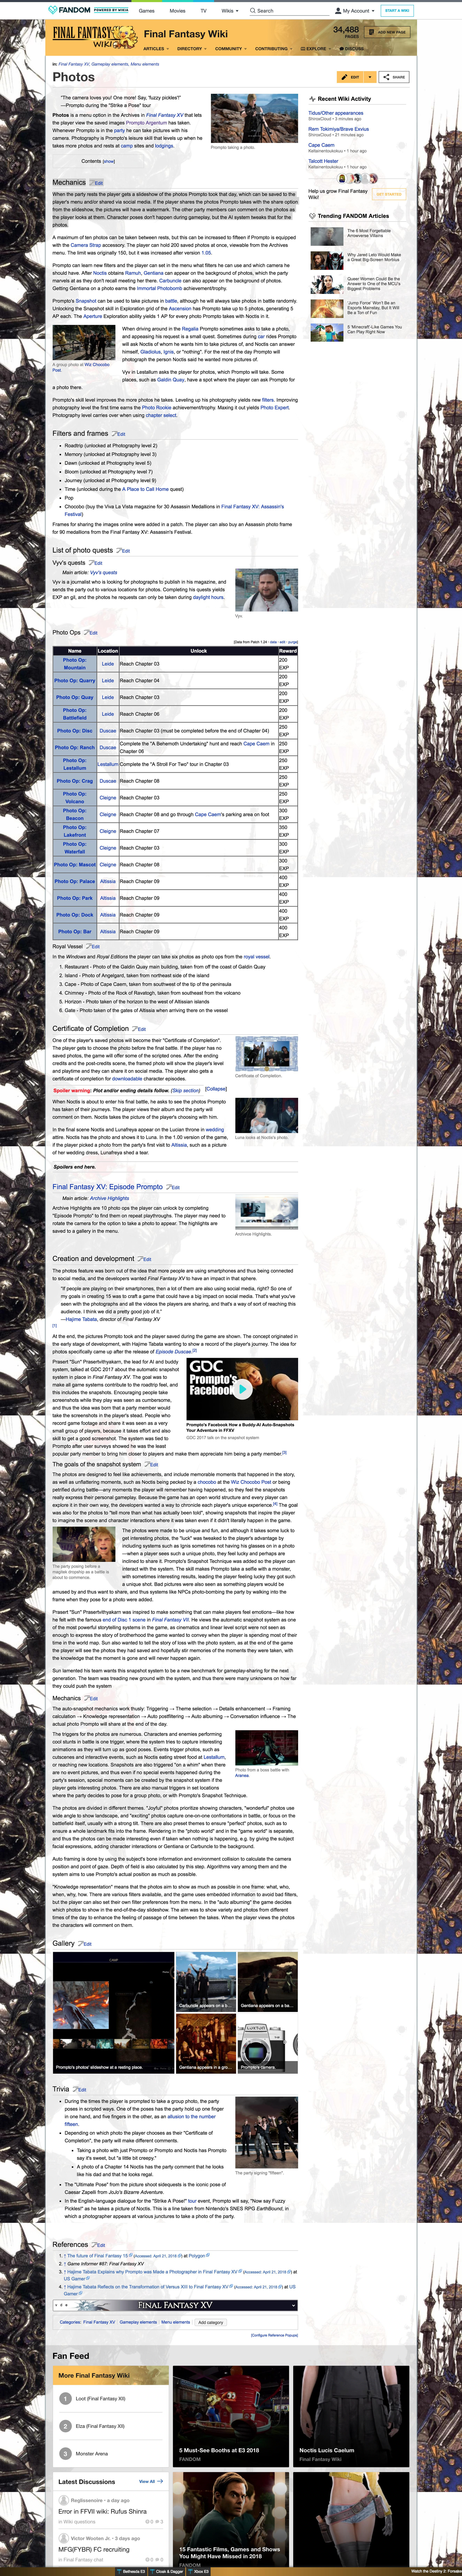 screencapture-finalfantasy-wikia-wiki-Photos-2018-07-03-00_10_17-2.png